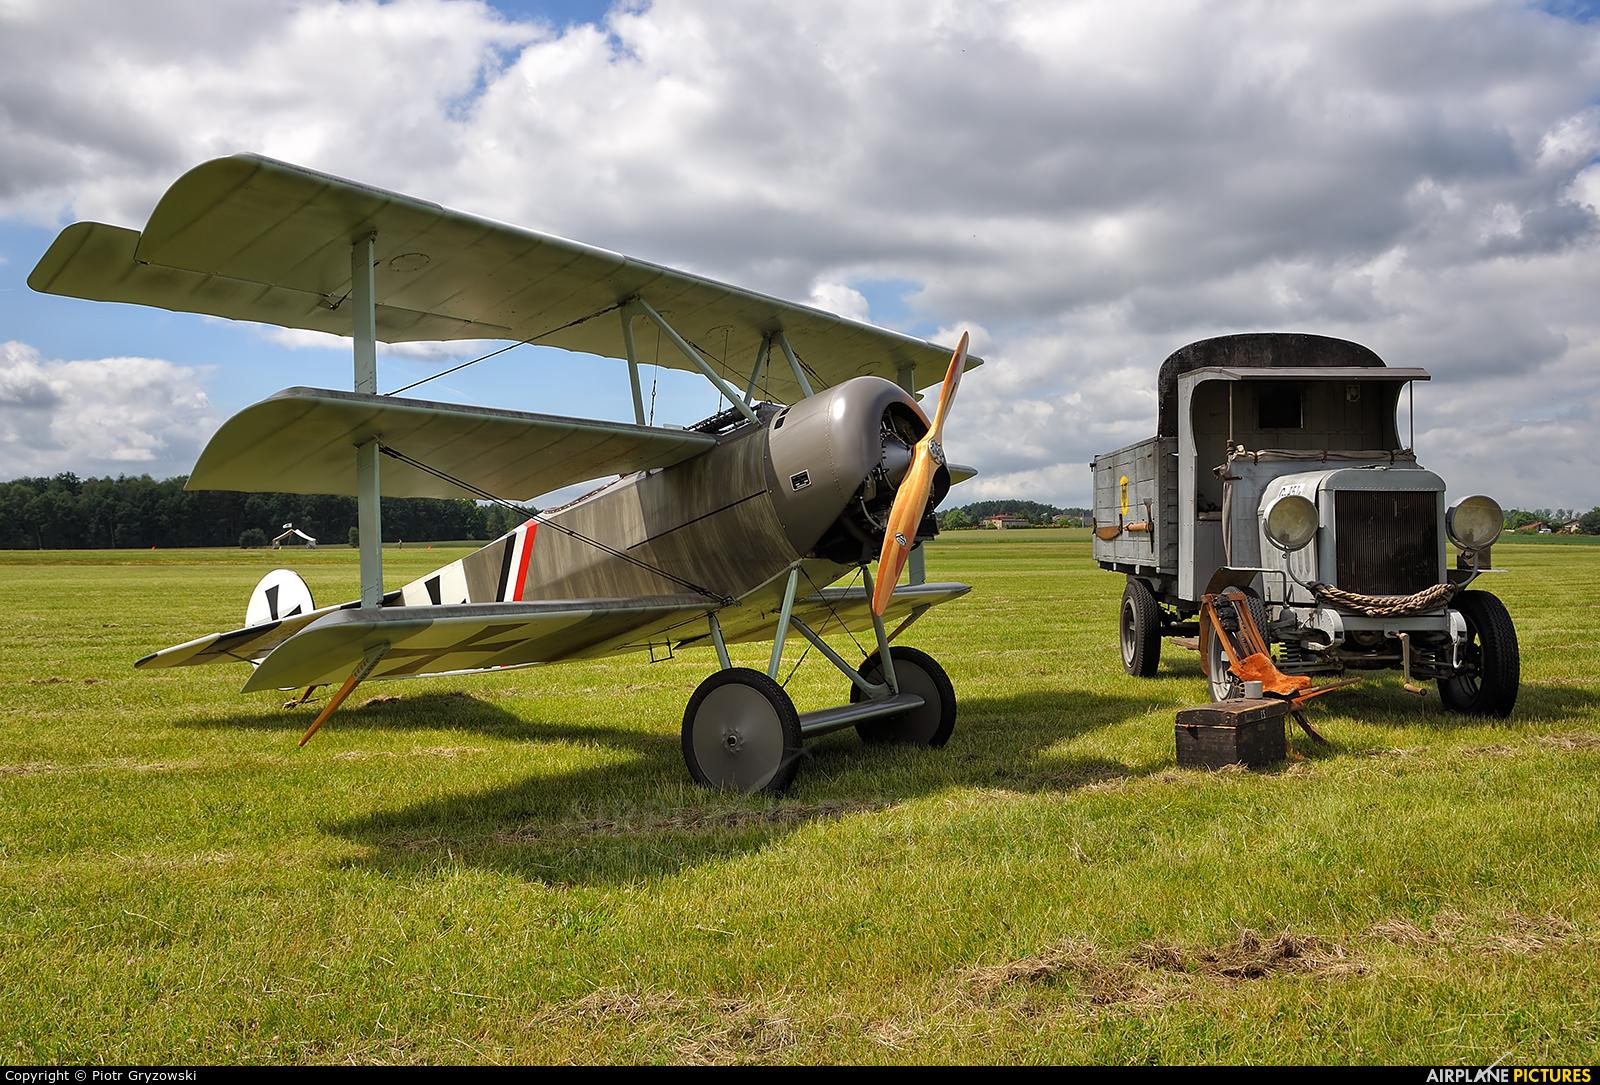 Private OK-TAV58 aircraft at Rybnik - Gotartowice